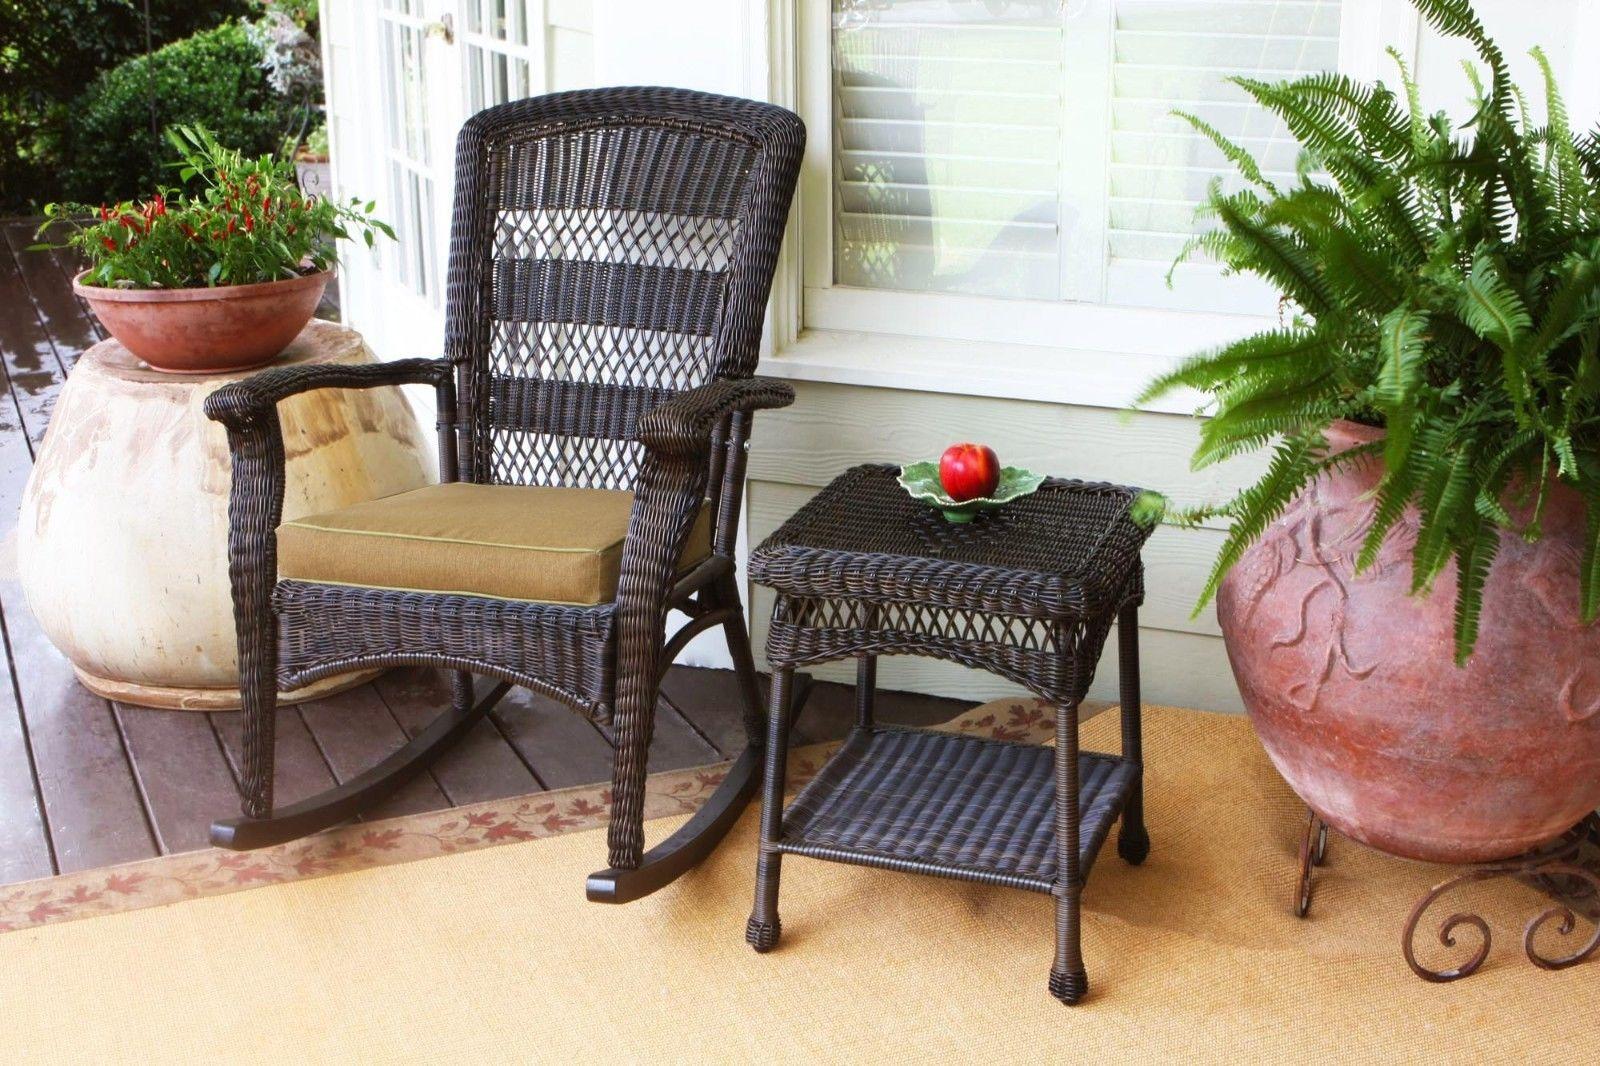 #9 - Outdoor Patio Garden Plantation Style Rocking Chair with Dark Roast Resin Wicker